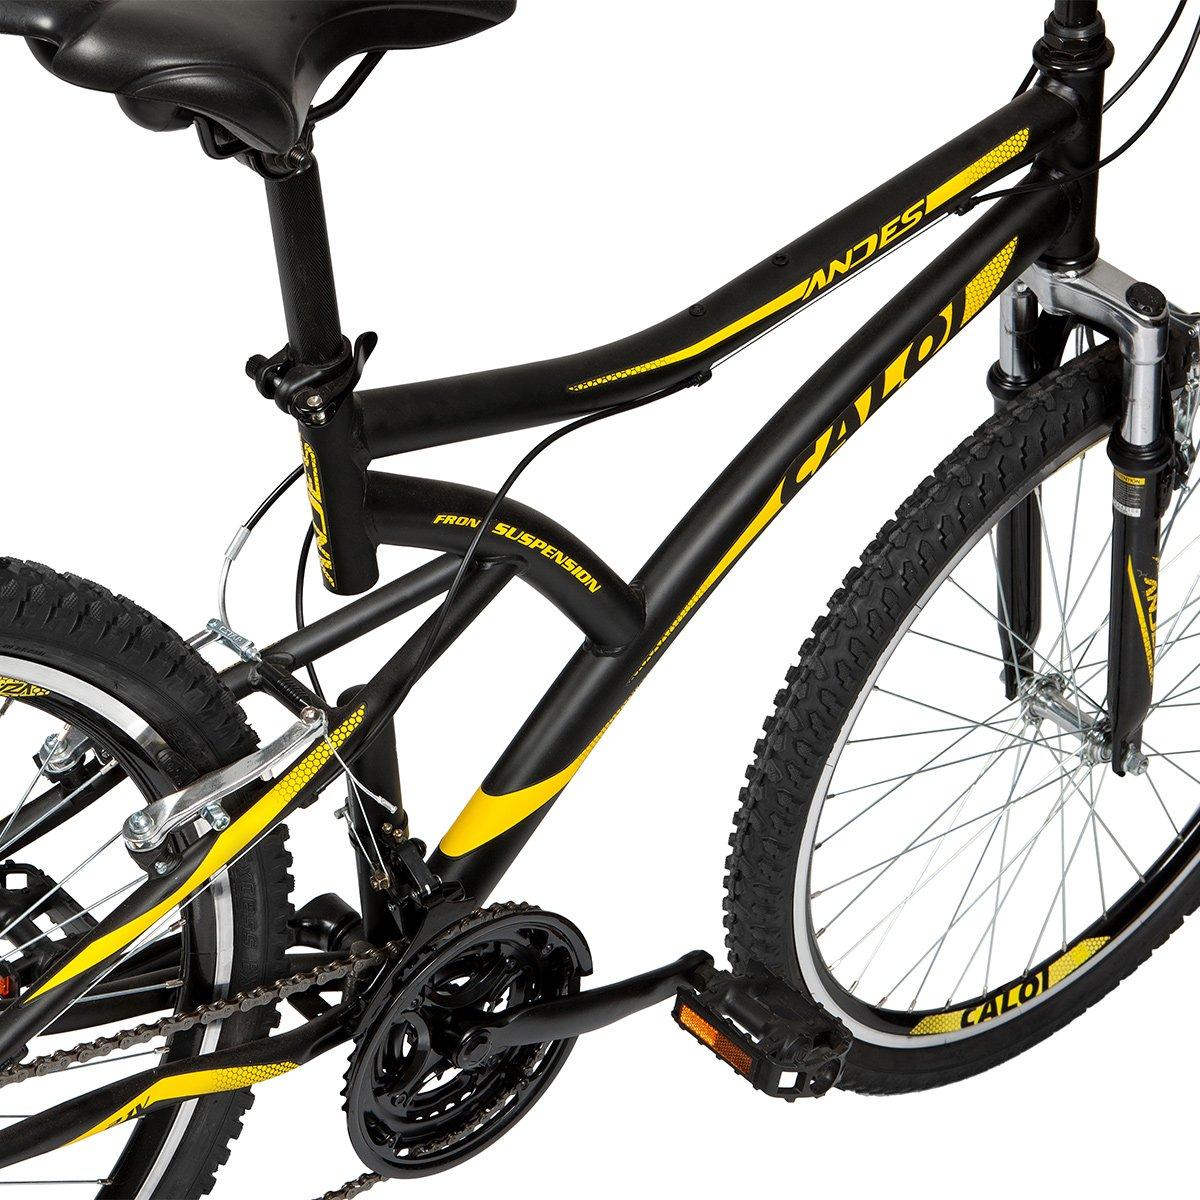 ... Bicicleta Aro 26 Mountain Bike Caloi Andes 21 Marchas Suspensão  Dianteira ... 253e867409bbb